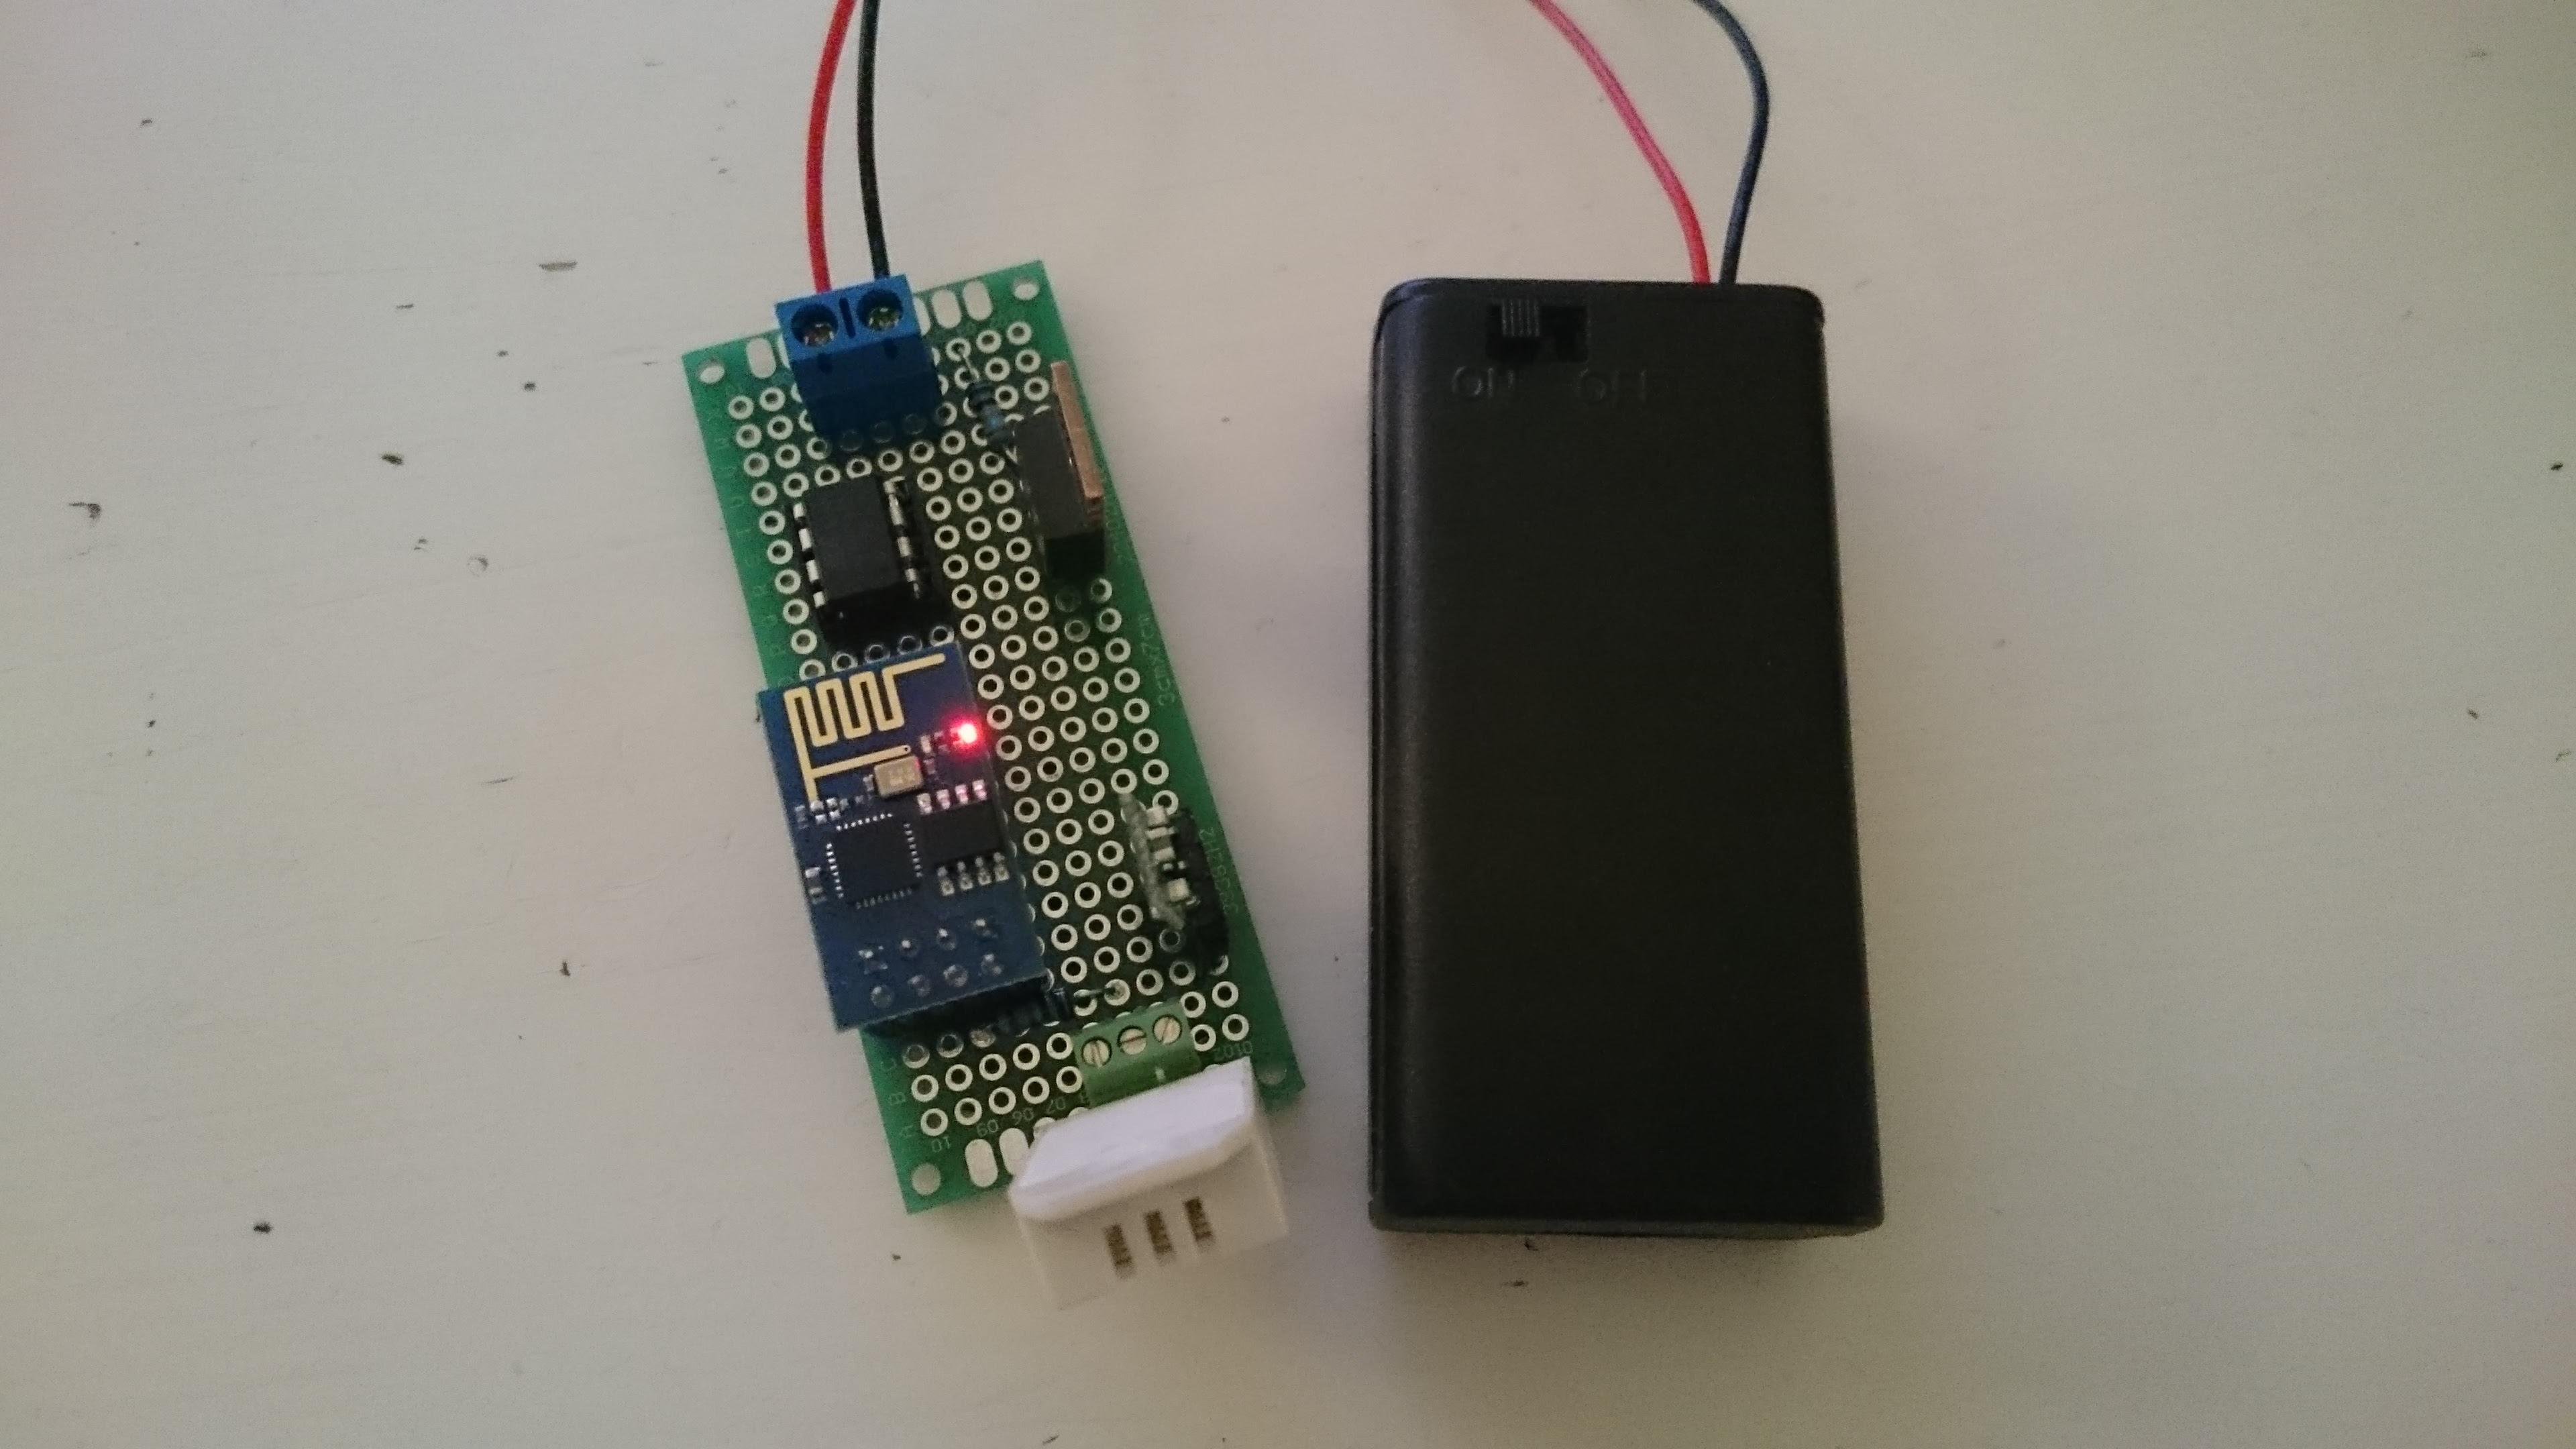 Battery Powered Esp8266 Iot Temperature Sensor Home Circuits Analog Controller 8211 Relay Dht2